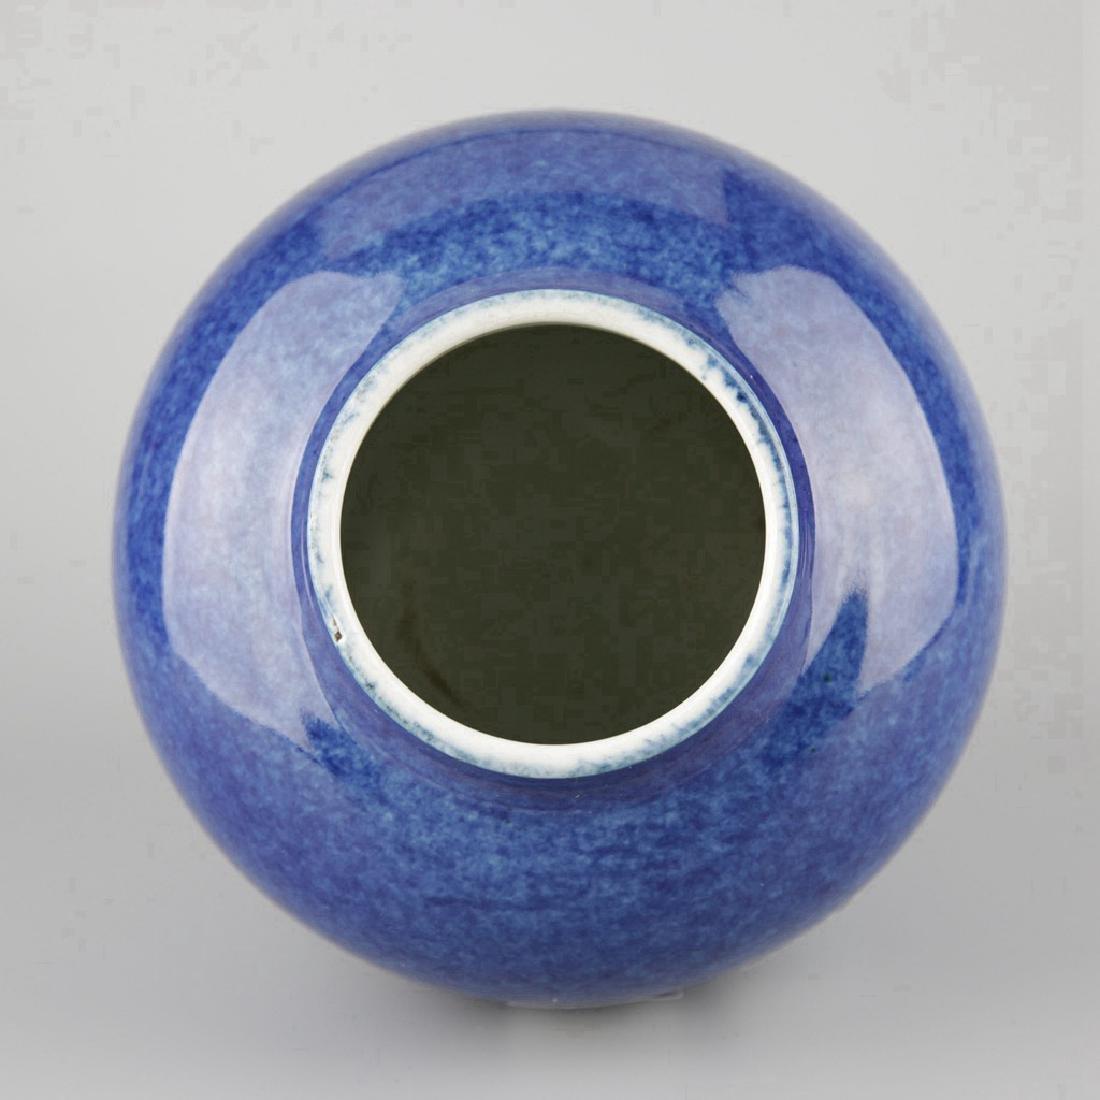 Chinese Porcelain Mottled Blue Vase - 3